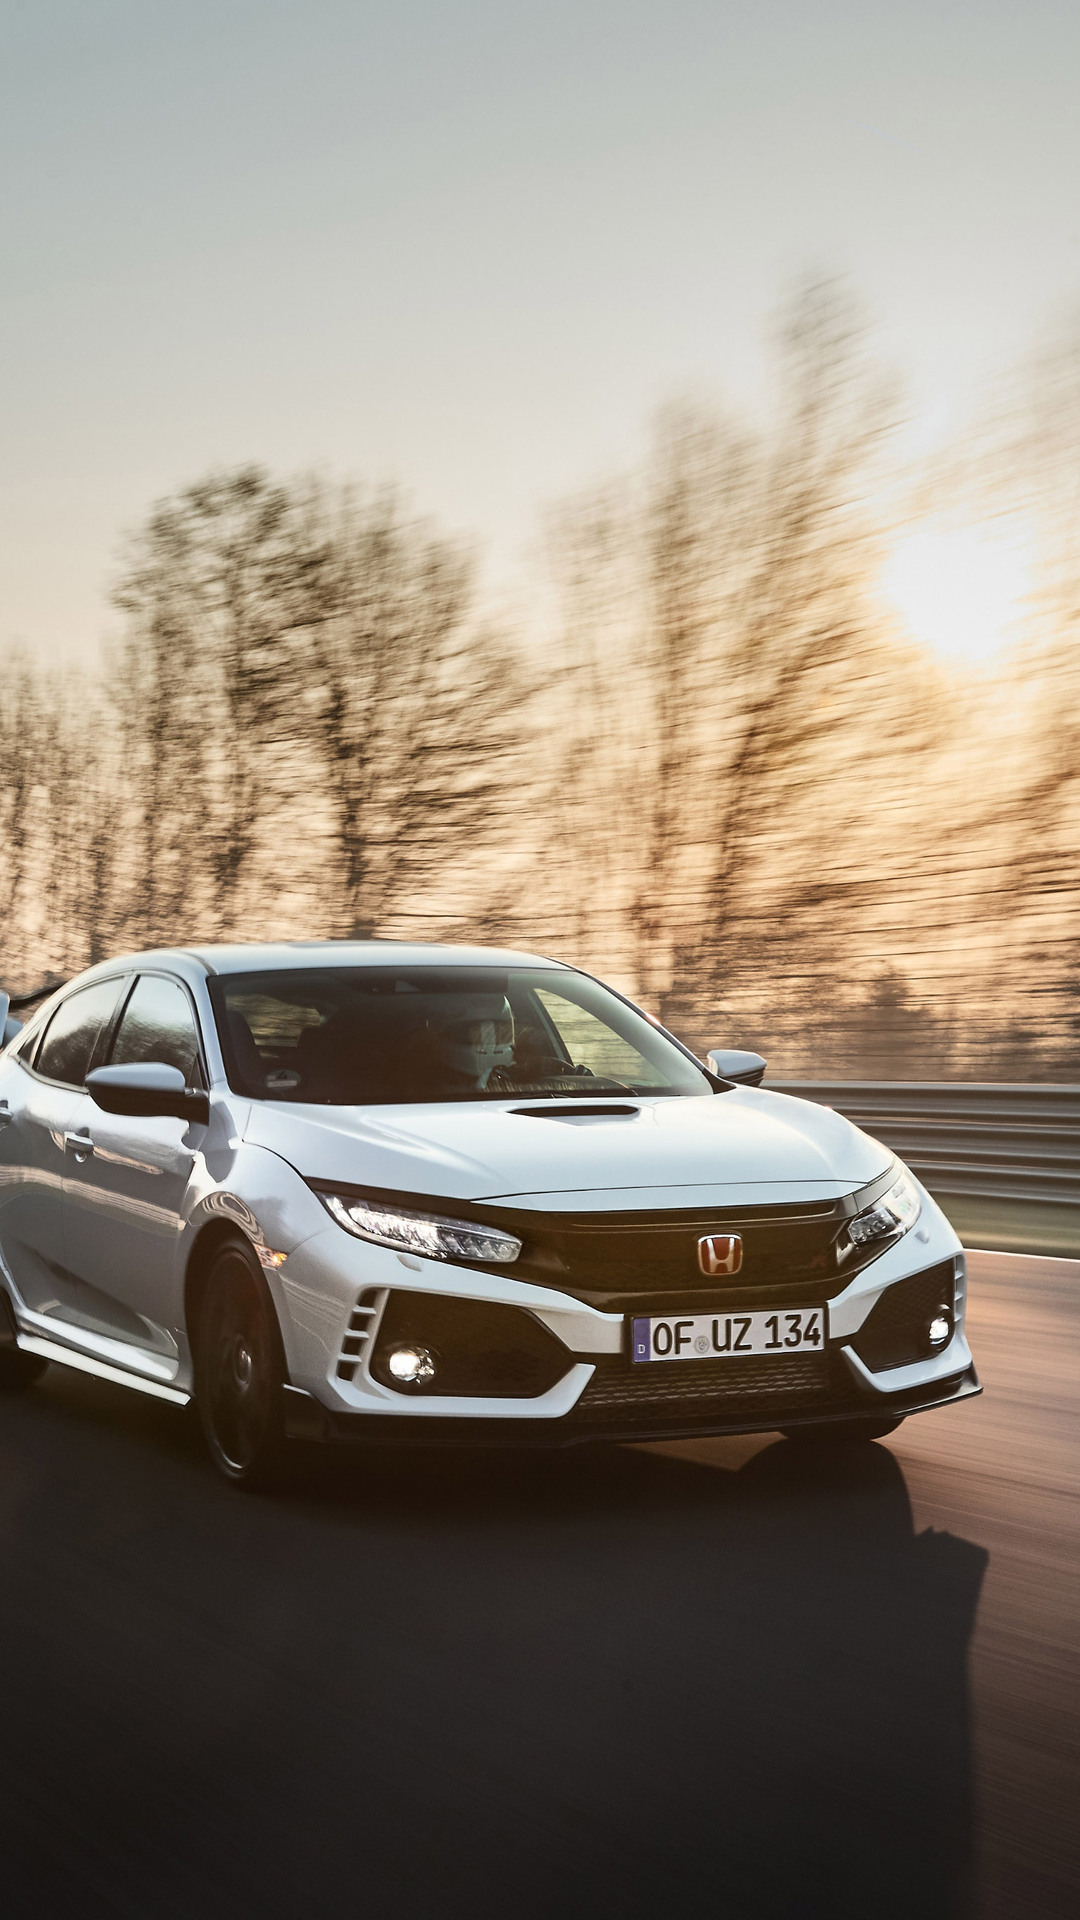 1080x1920 Honda Civic Type R 4k Iphone 7,6s,6 Plus, Pixel ...